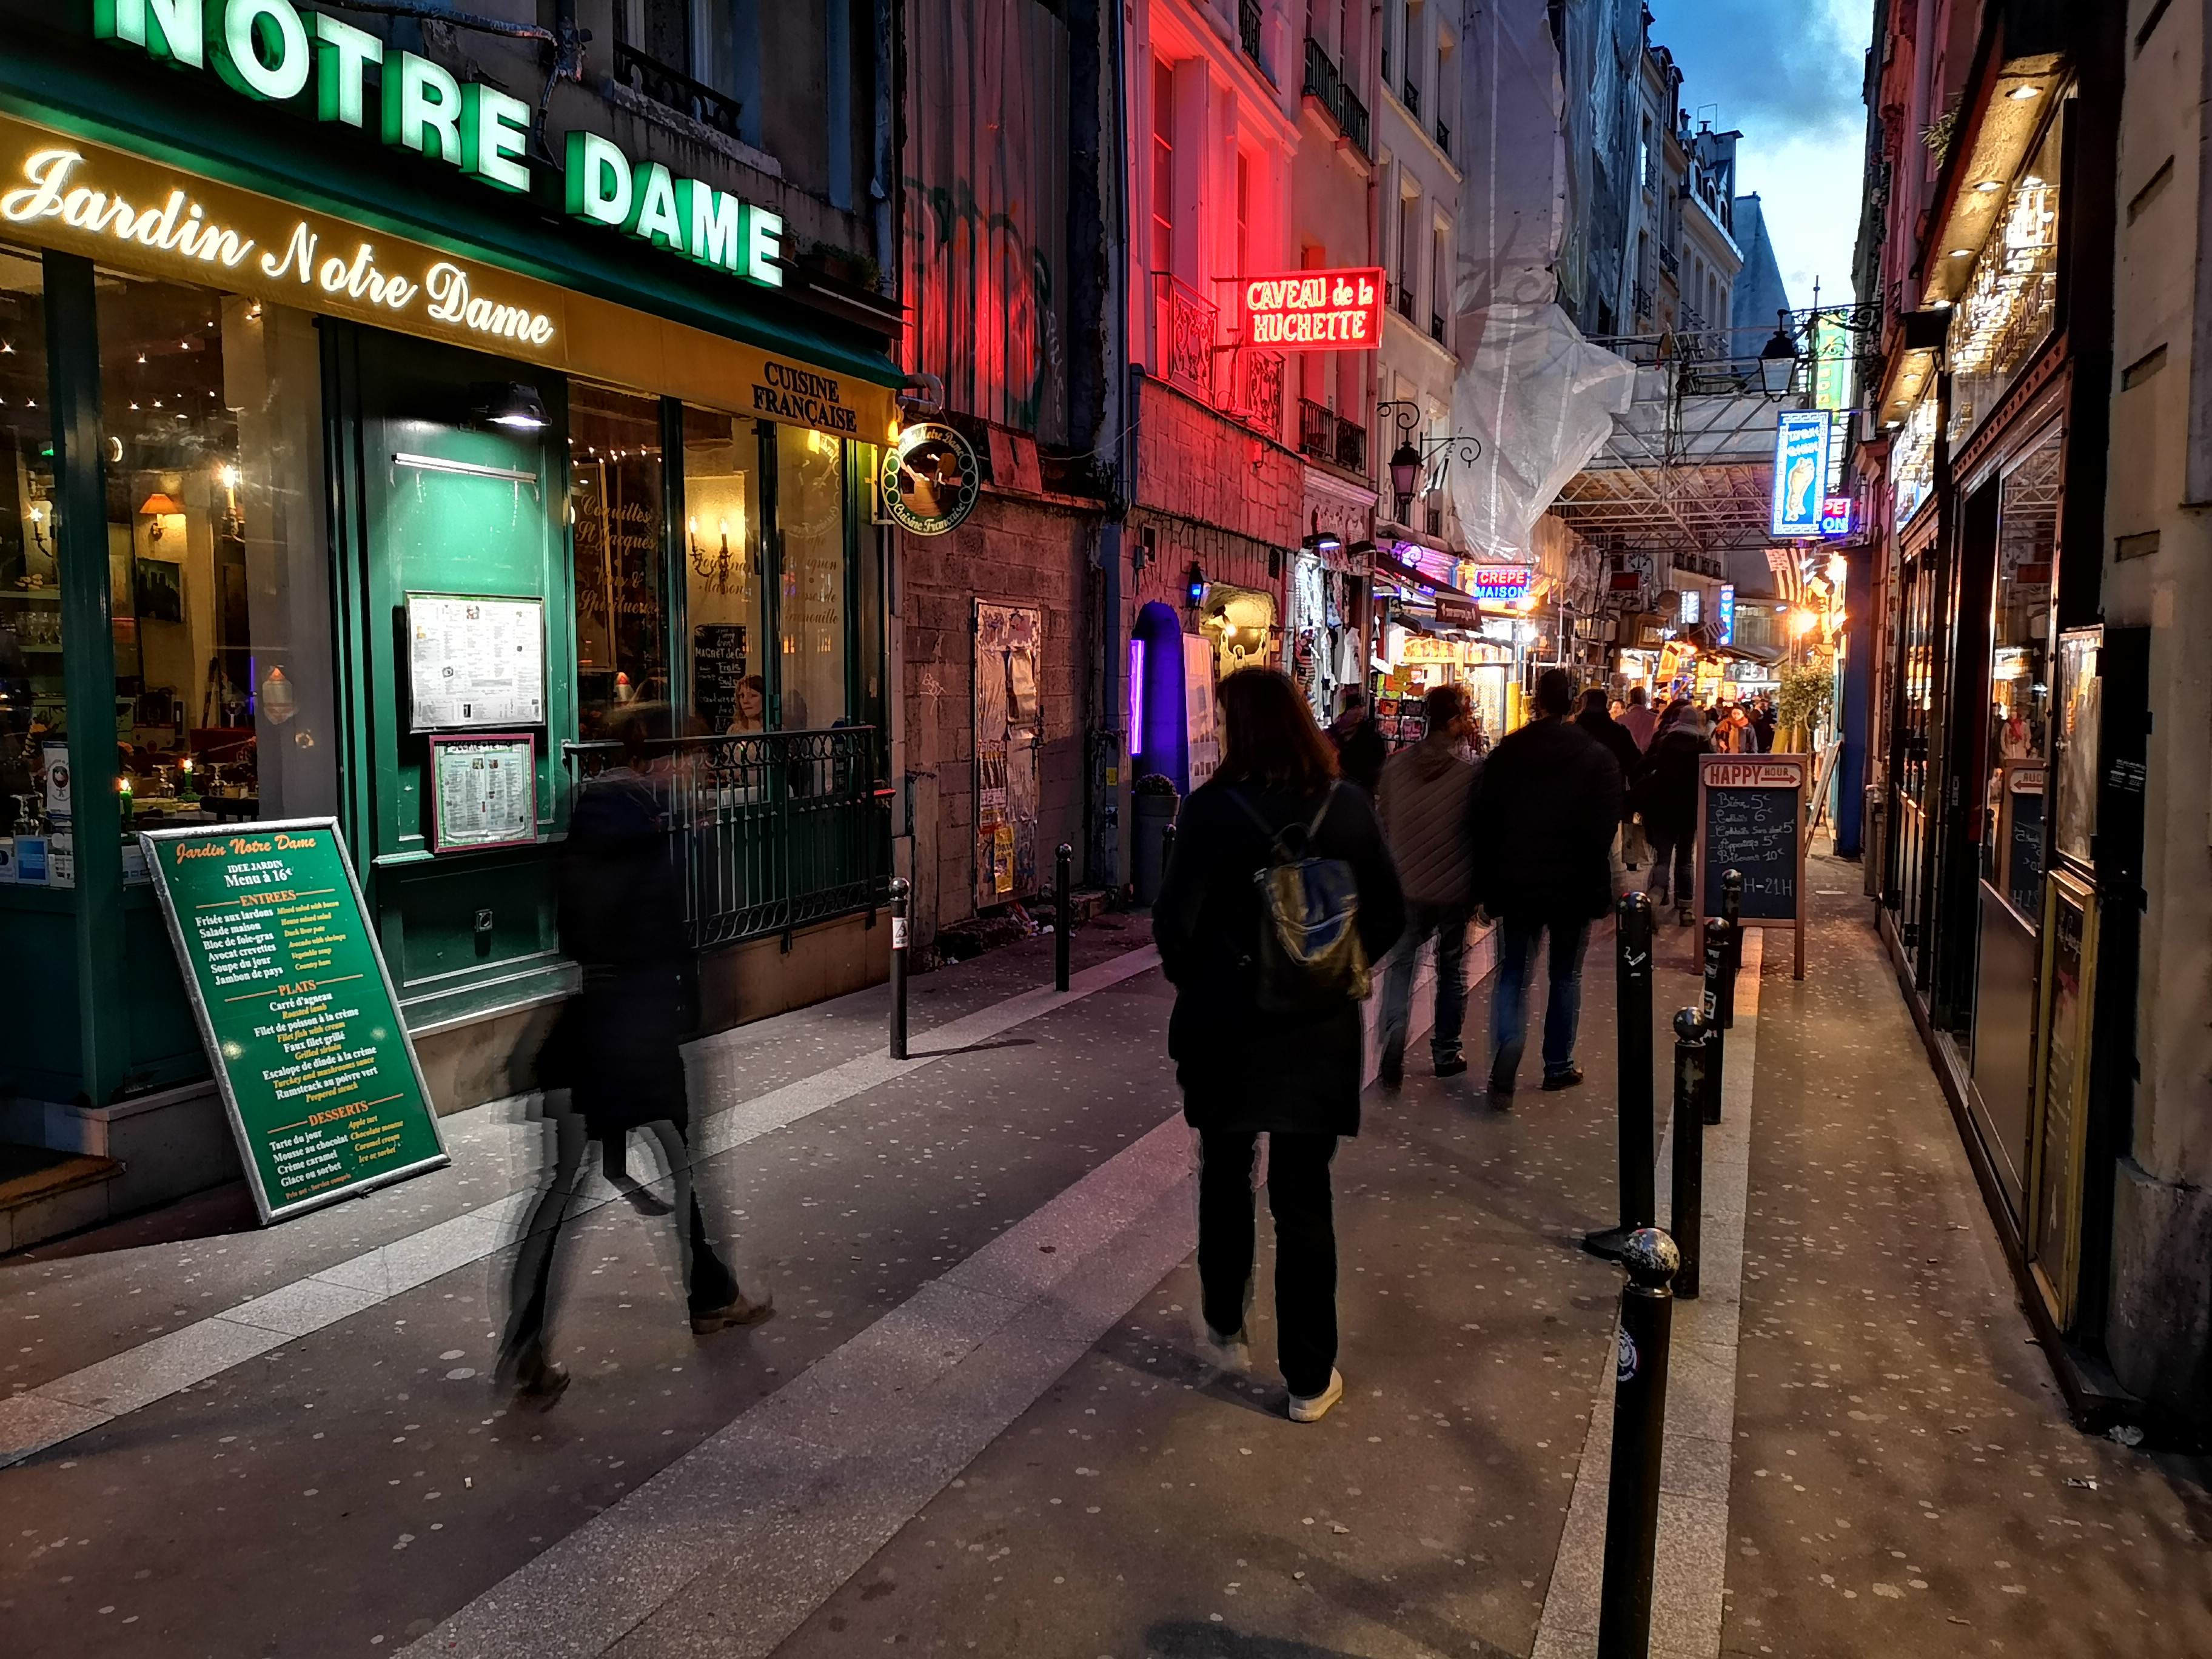 Good Https://cdn.gsmarena.com/imgroot/reviews /18/huawei P20 Pro Camera Paris/camera/gsmarena_019